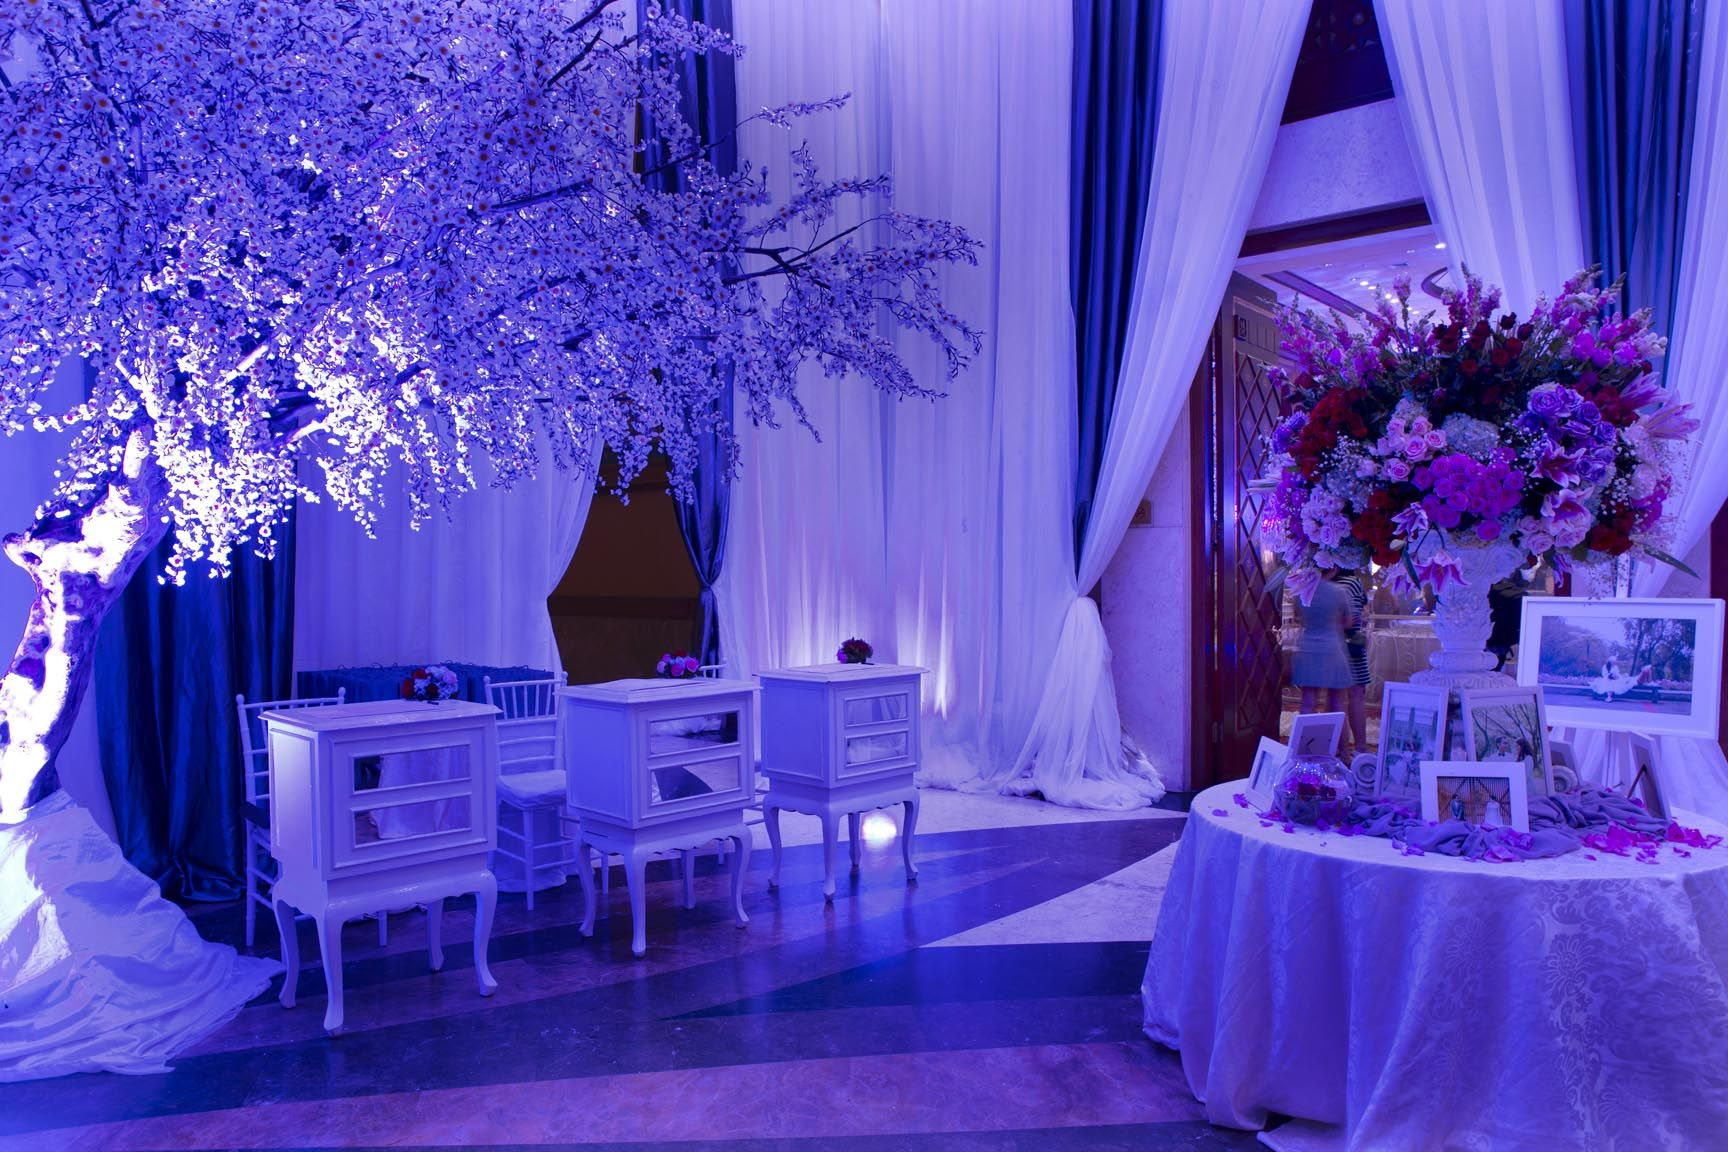 Mawarprada dekorasi pernikahan pelaminan wedding decoration mawarprada dekorasi pernikahan pelaminan wedding decoration romantic purple junglespirit Choice Image